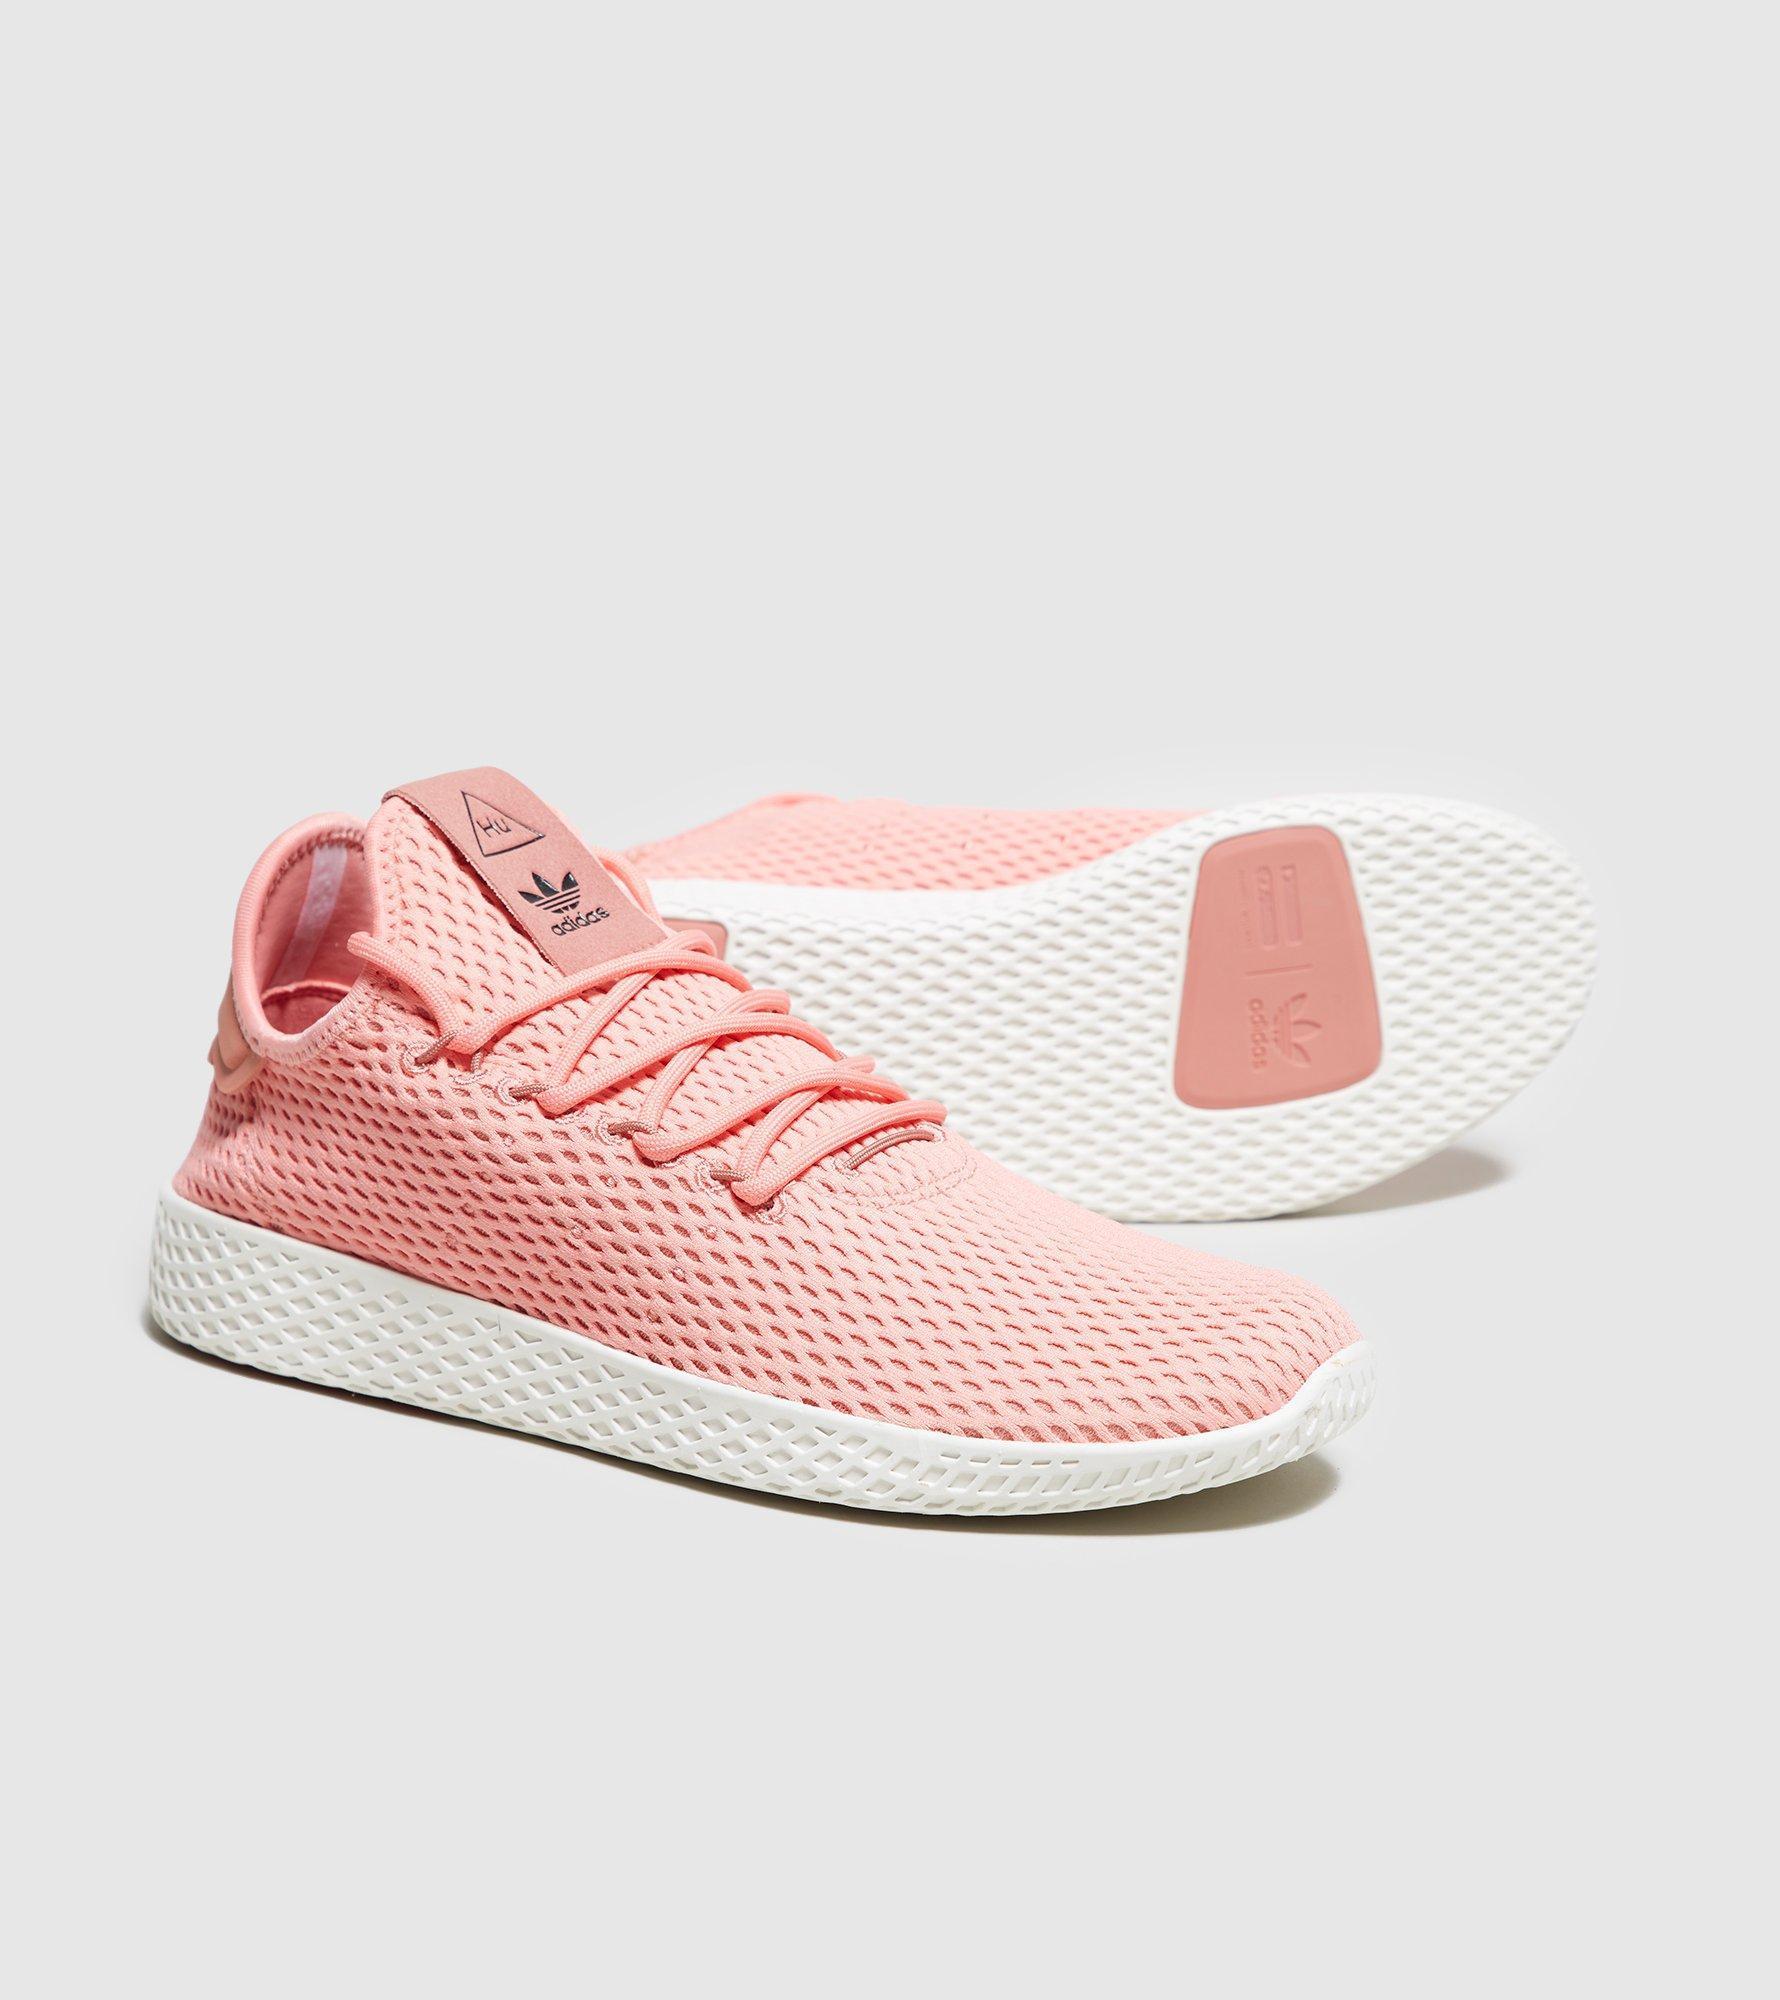 fea4bcc58 Lyst - adidas Originals Pharrell Williams Tennis Hu in Pink